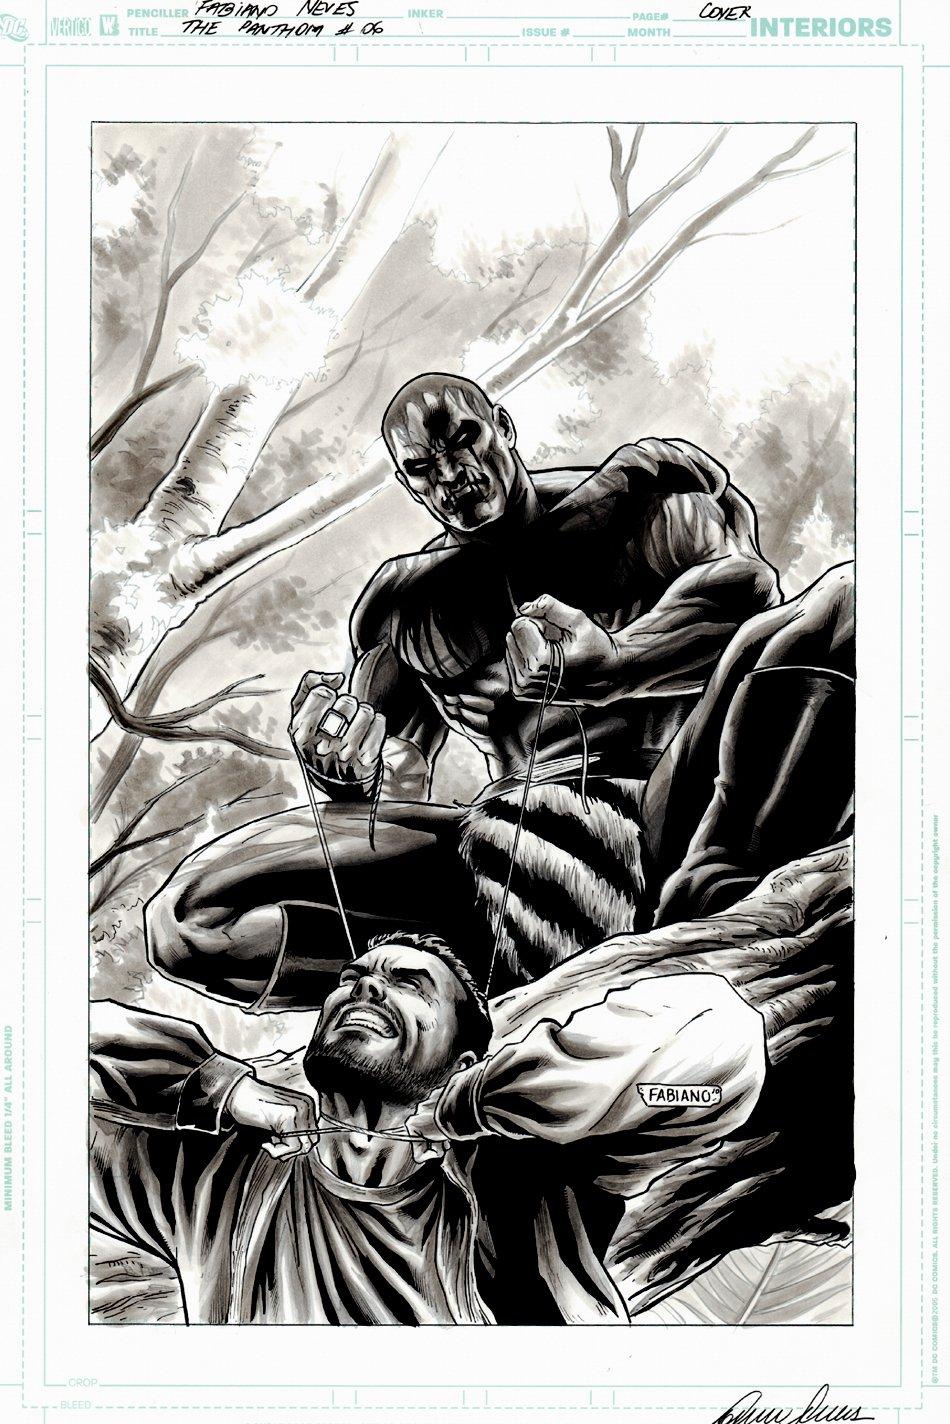 The Last Phantom #6 Cover (2010)